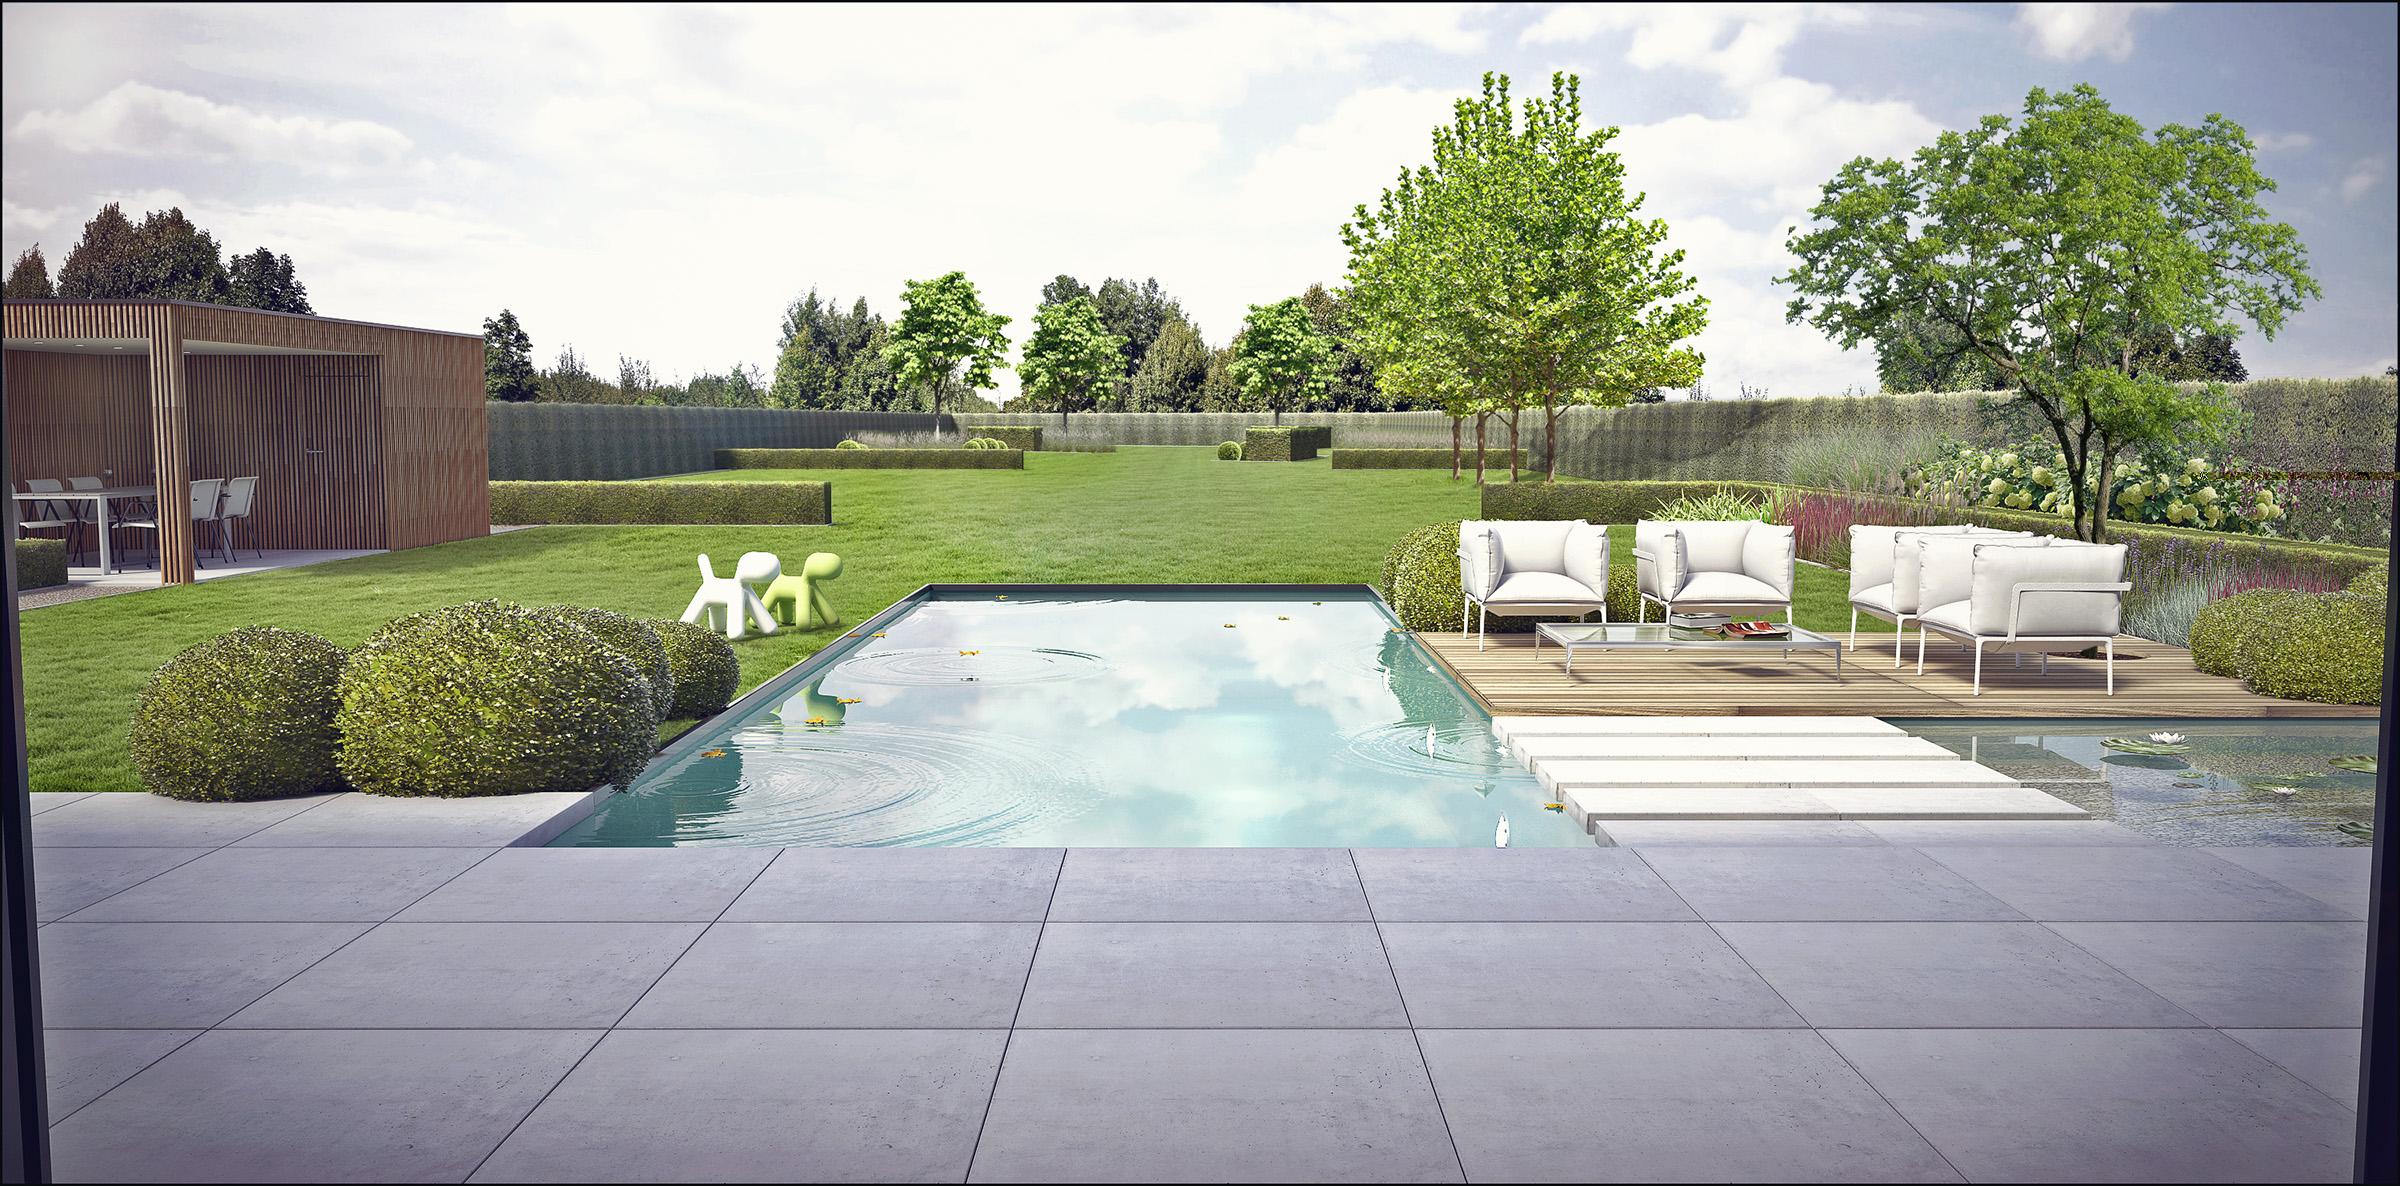 Eco tuinarchitectengroep 3d projecten tuin moderne woning for Beeld tuin modern